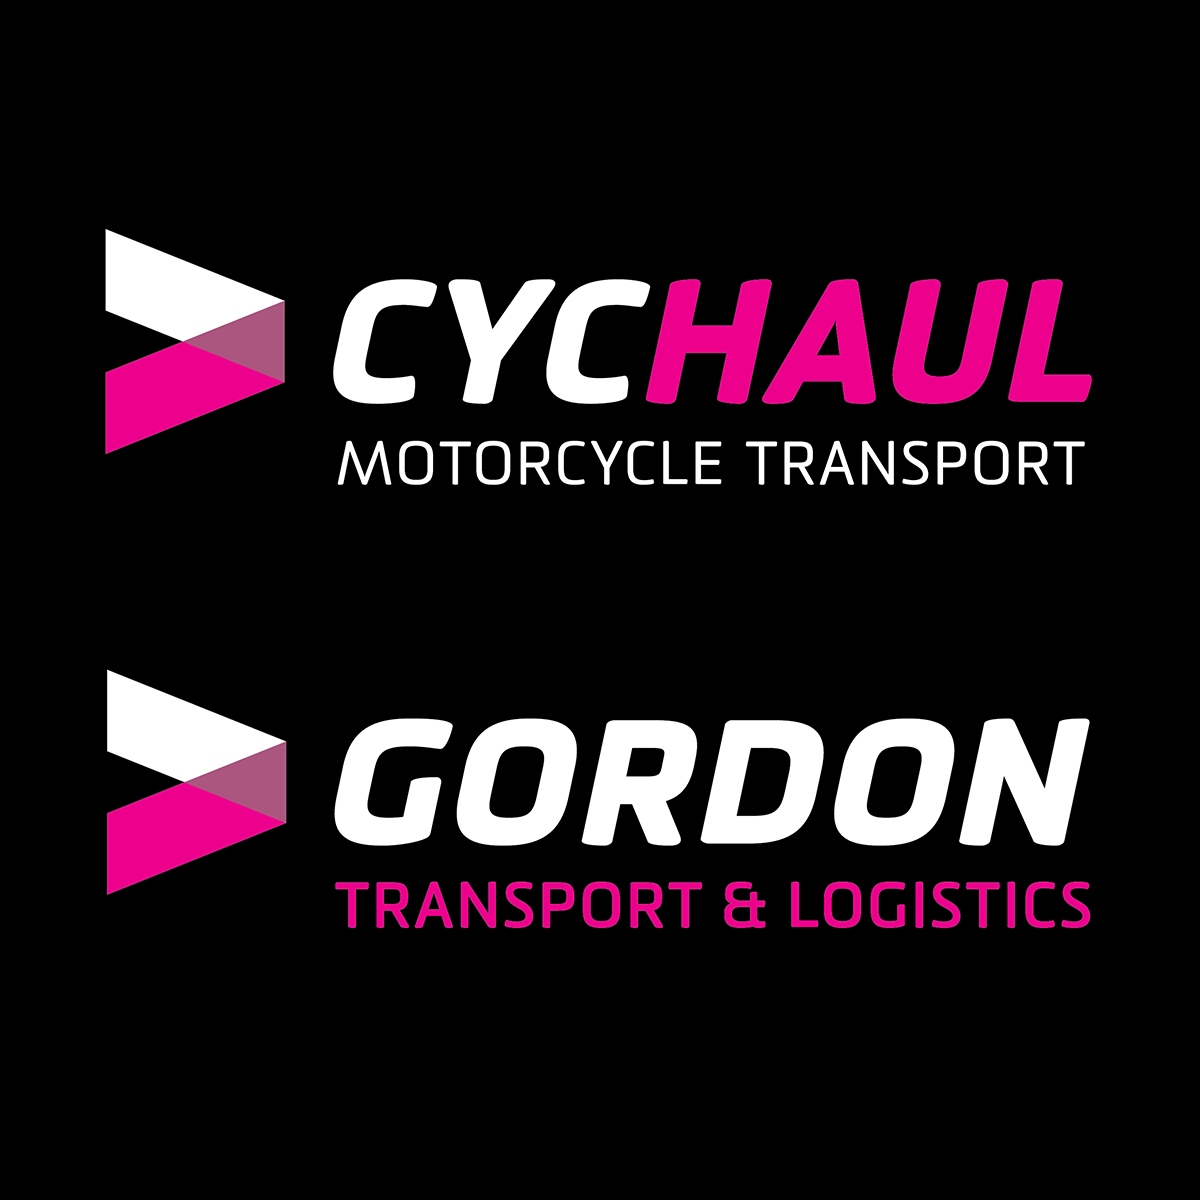 cychaul-gtl-branding-logo-design-black.jpg